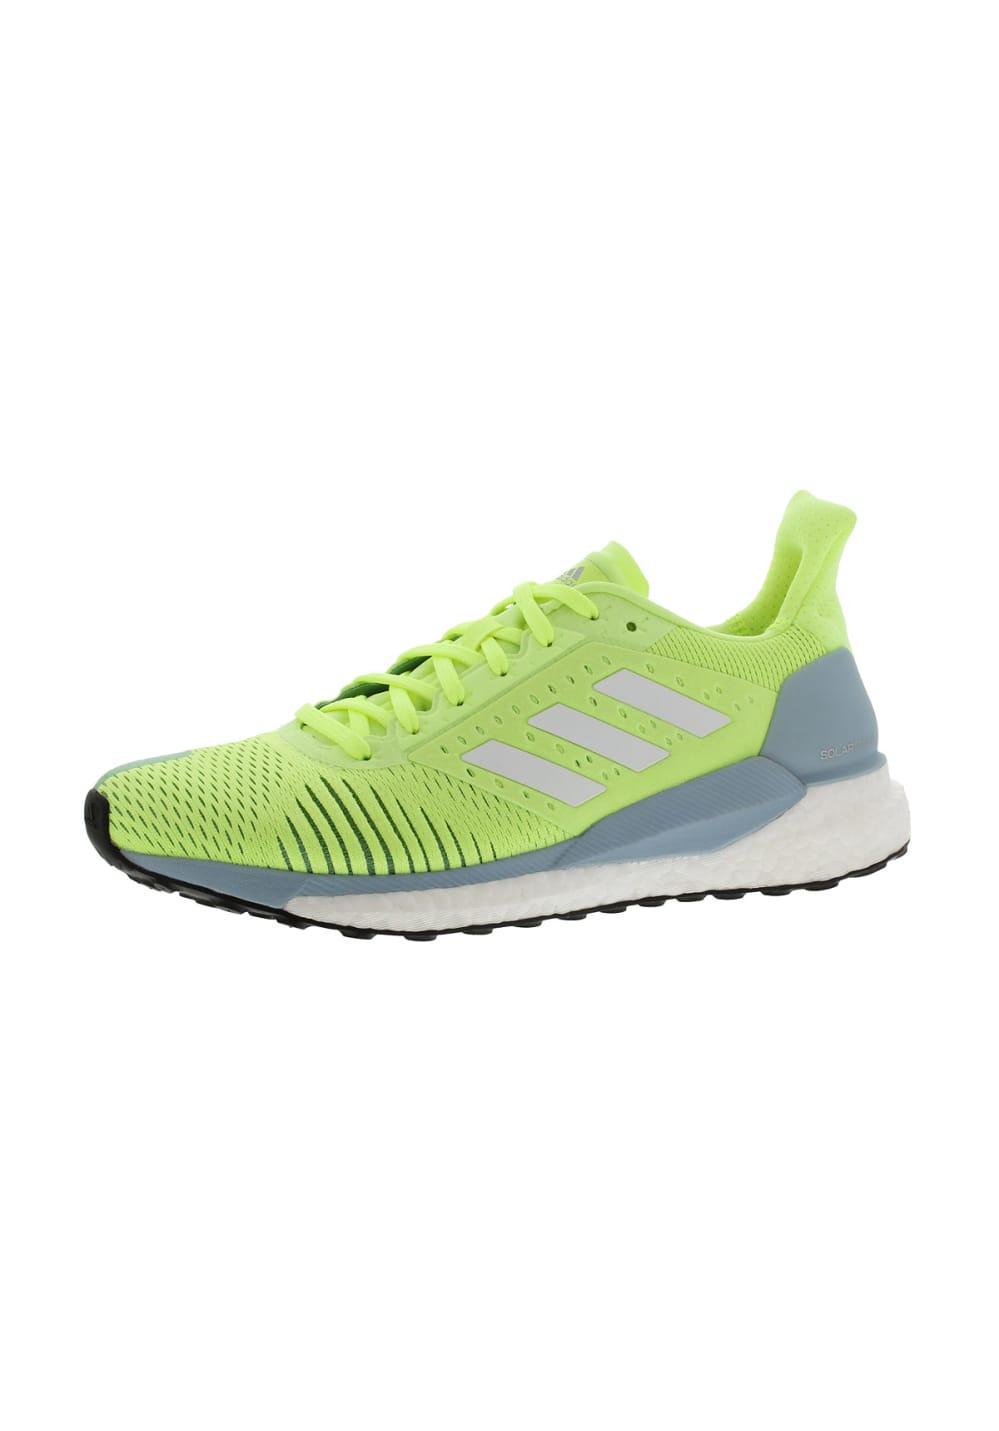 code promo 182b3 32e28 adidas Solar Glide St - Chaussures running pour Femme - Vert